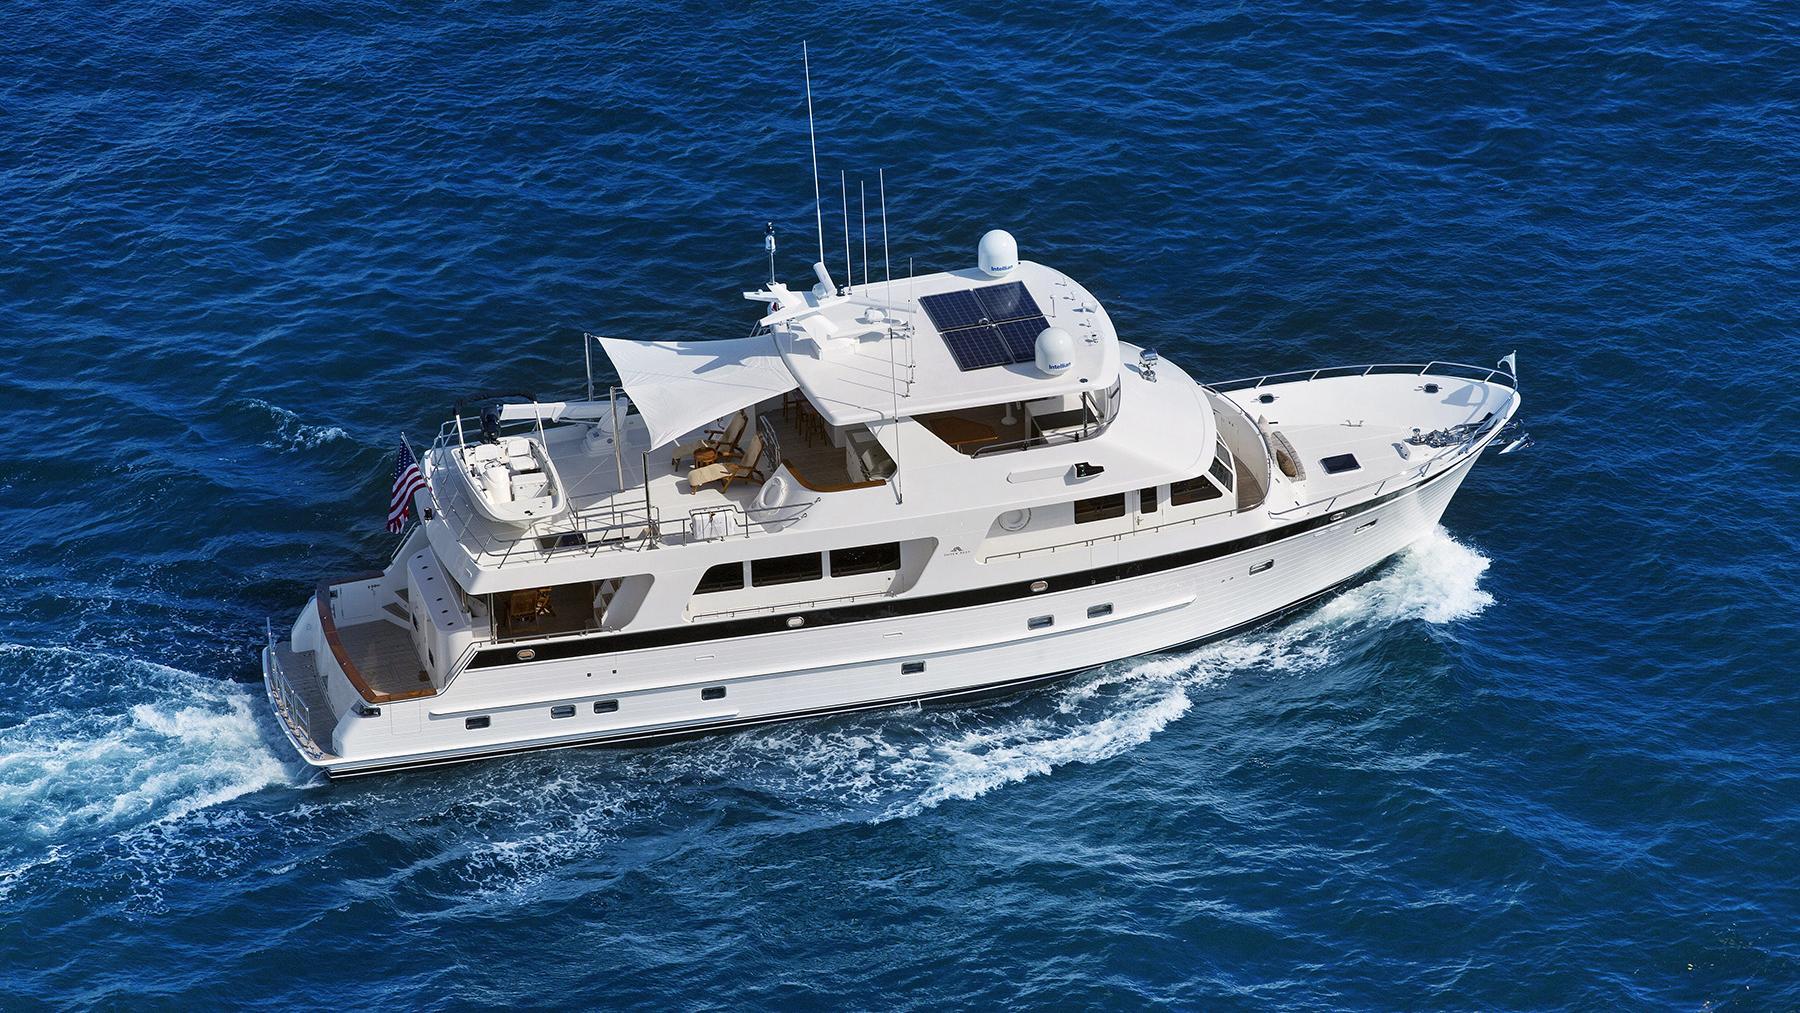 barbara sue ii motoryacht outer reef yachts 2015 25m aerial